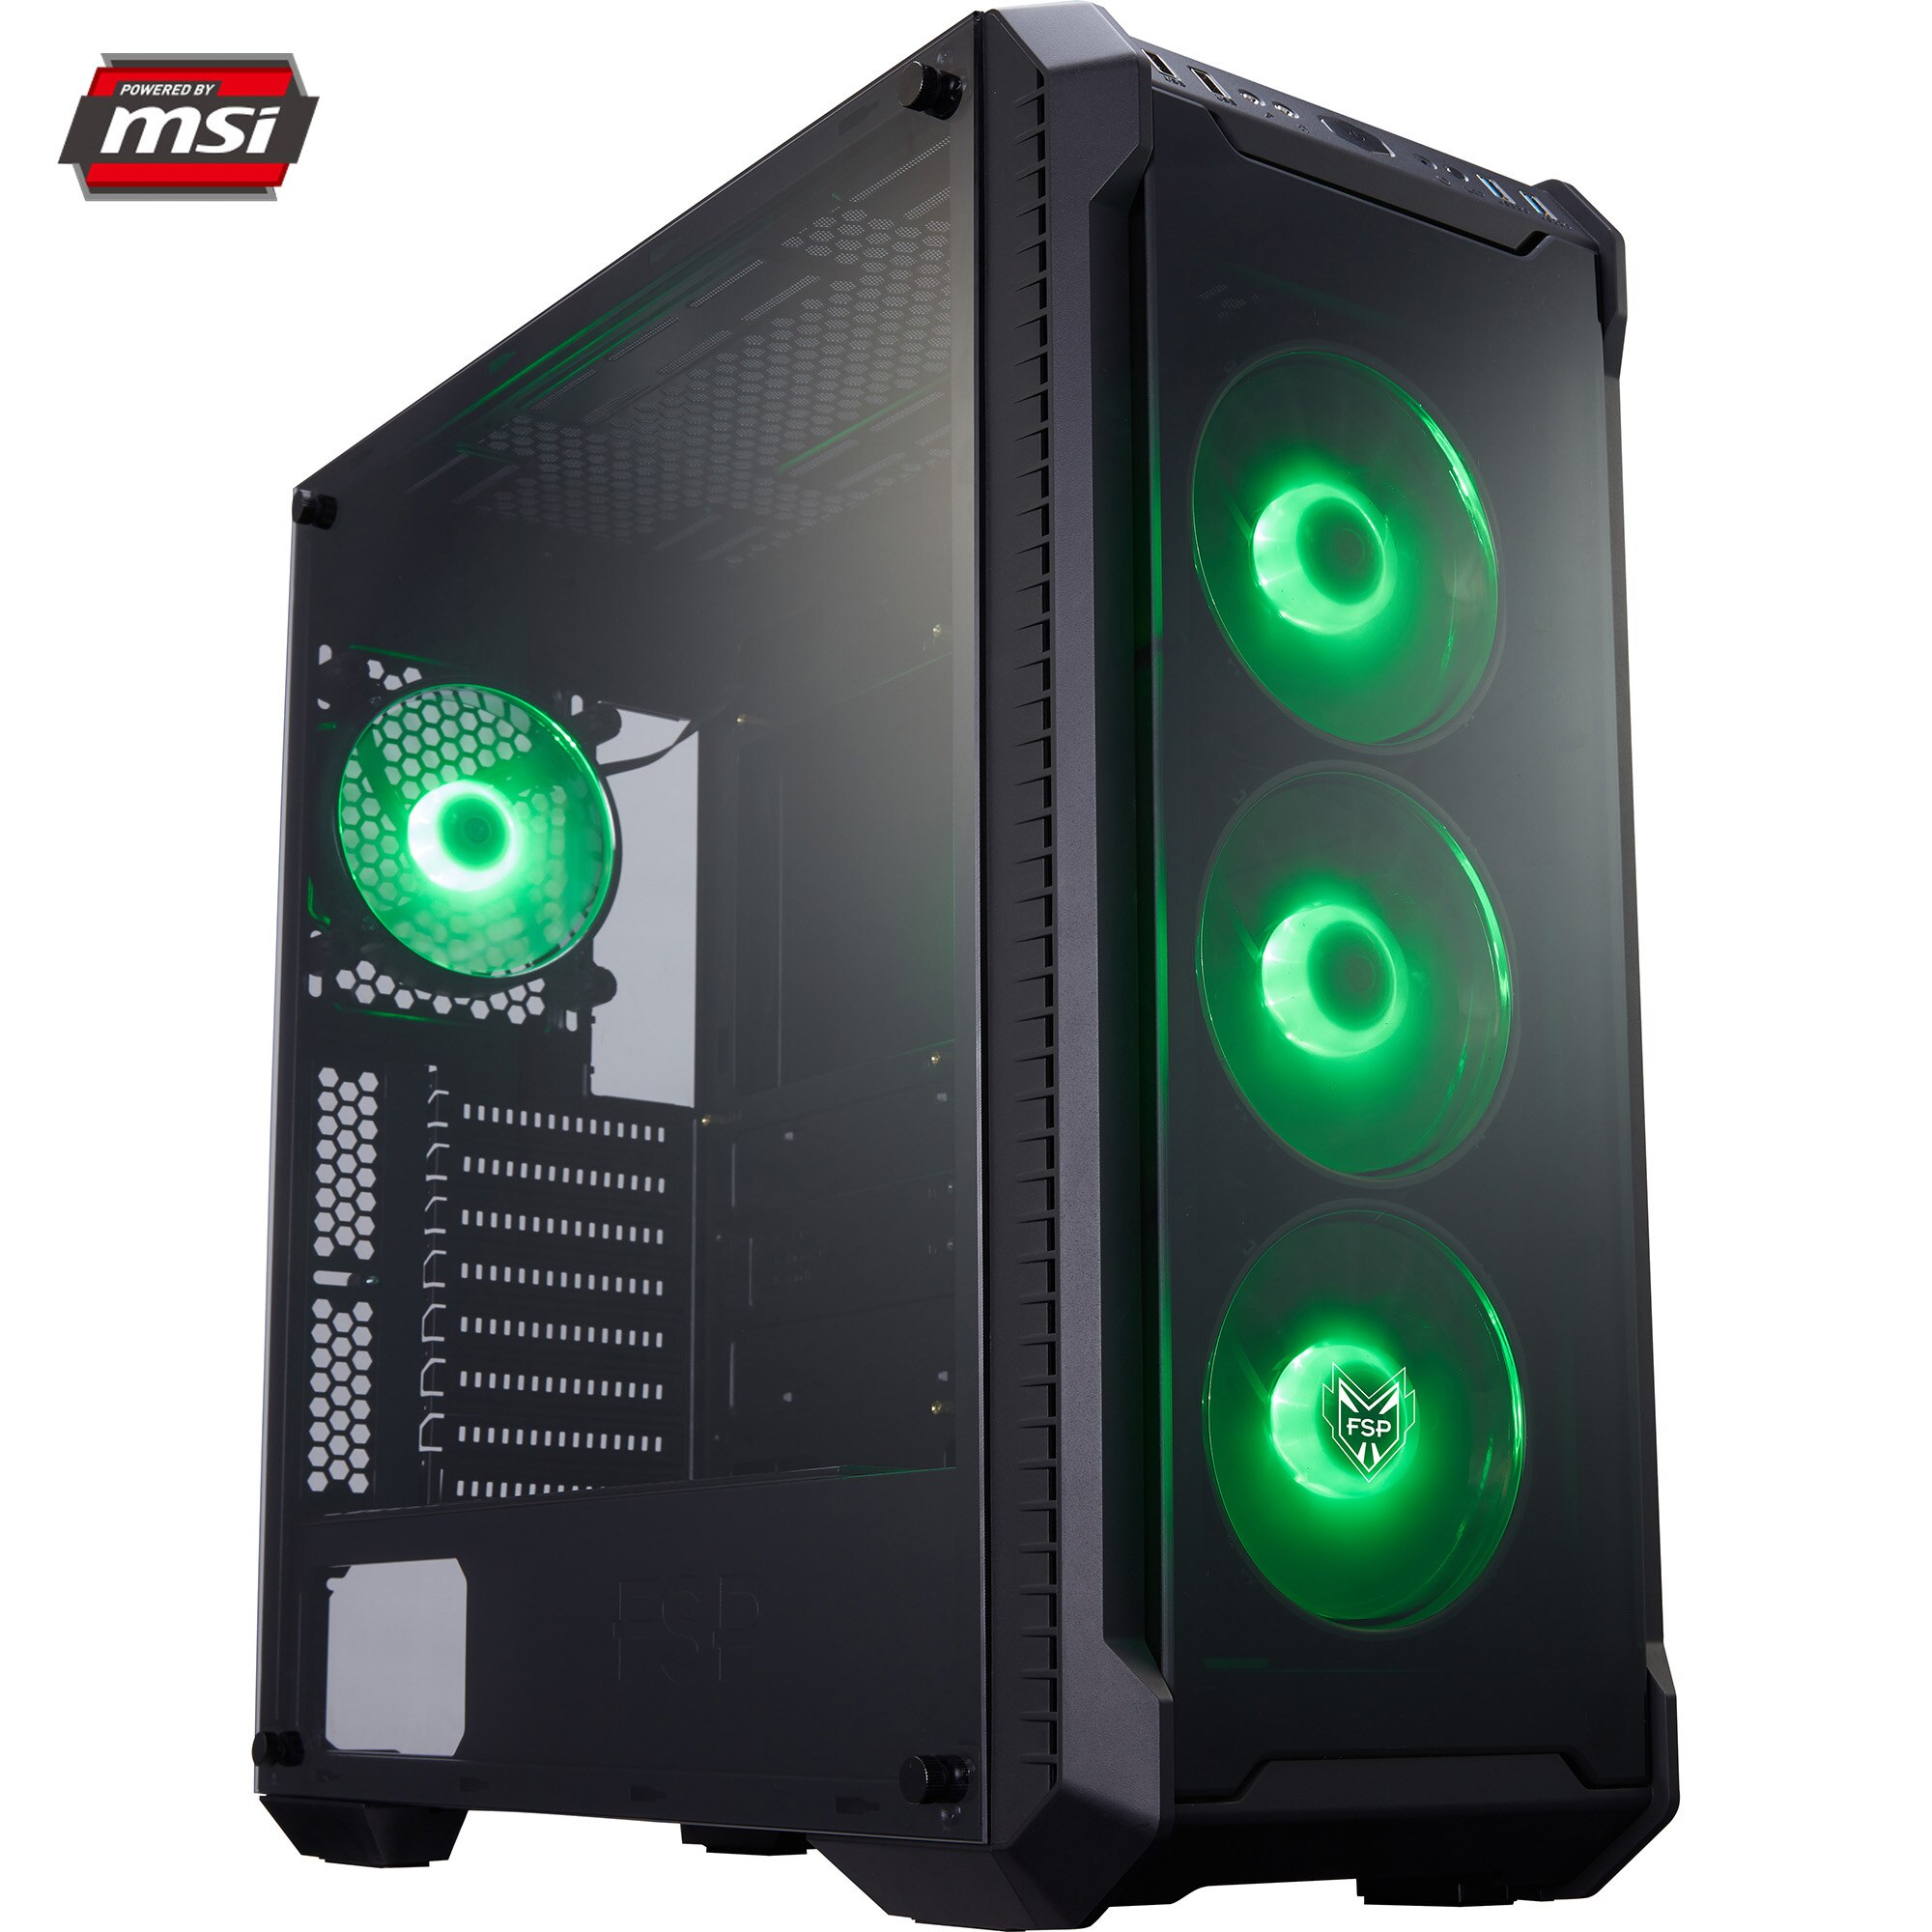 Fotografie Sistem Desktop PC Gaming Serioux Powered by MSI cu procesor AMD Ryzen 9 3900X pana la 4.60GHz, 32GB DDR4, 1TB SSD M.2 PCIe, GeForce RTX 2080 Super™ 8GB GDDR6